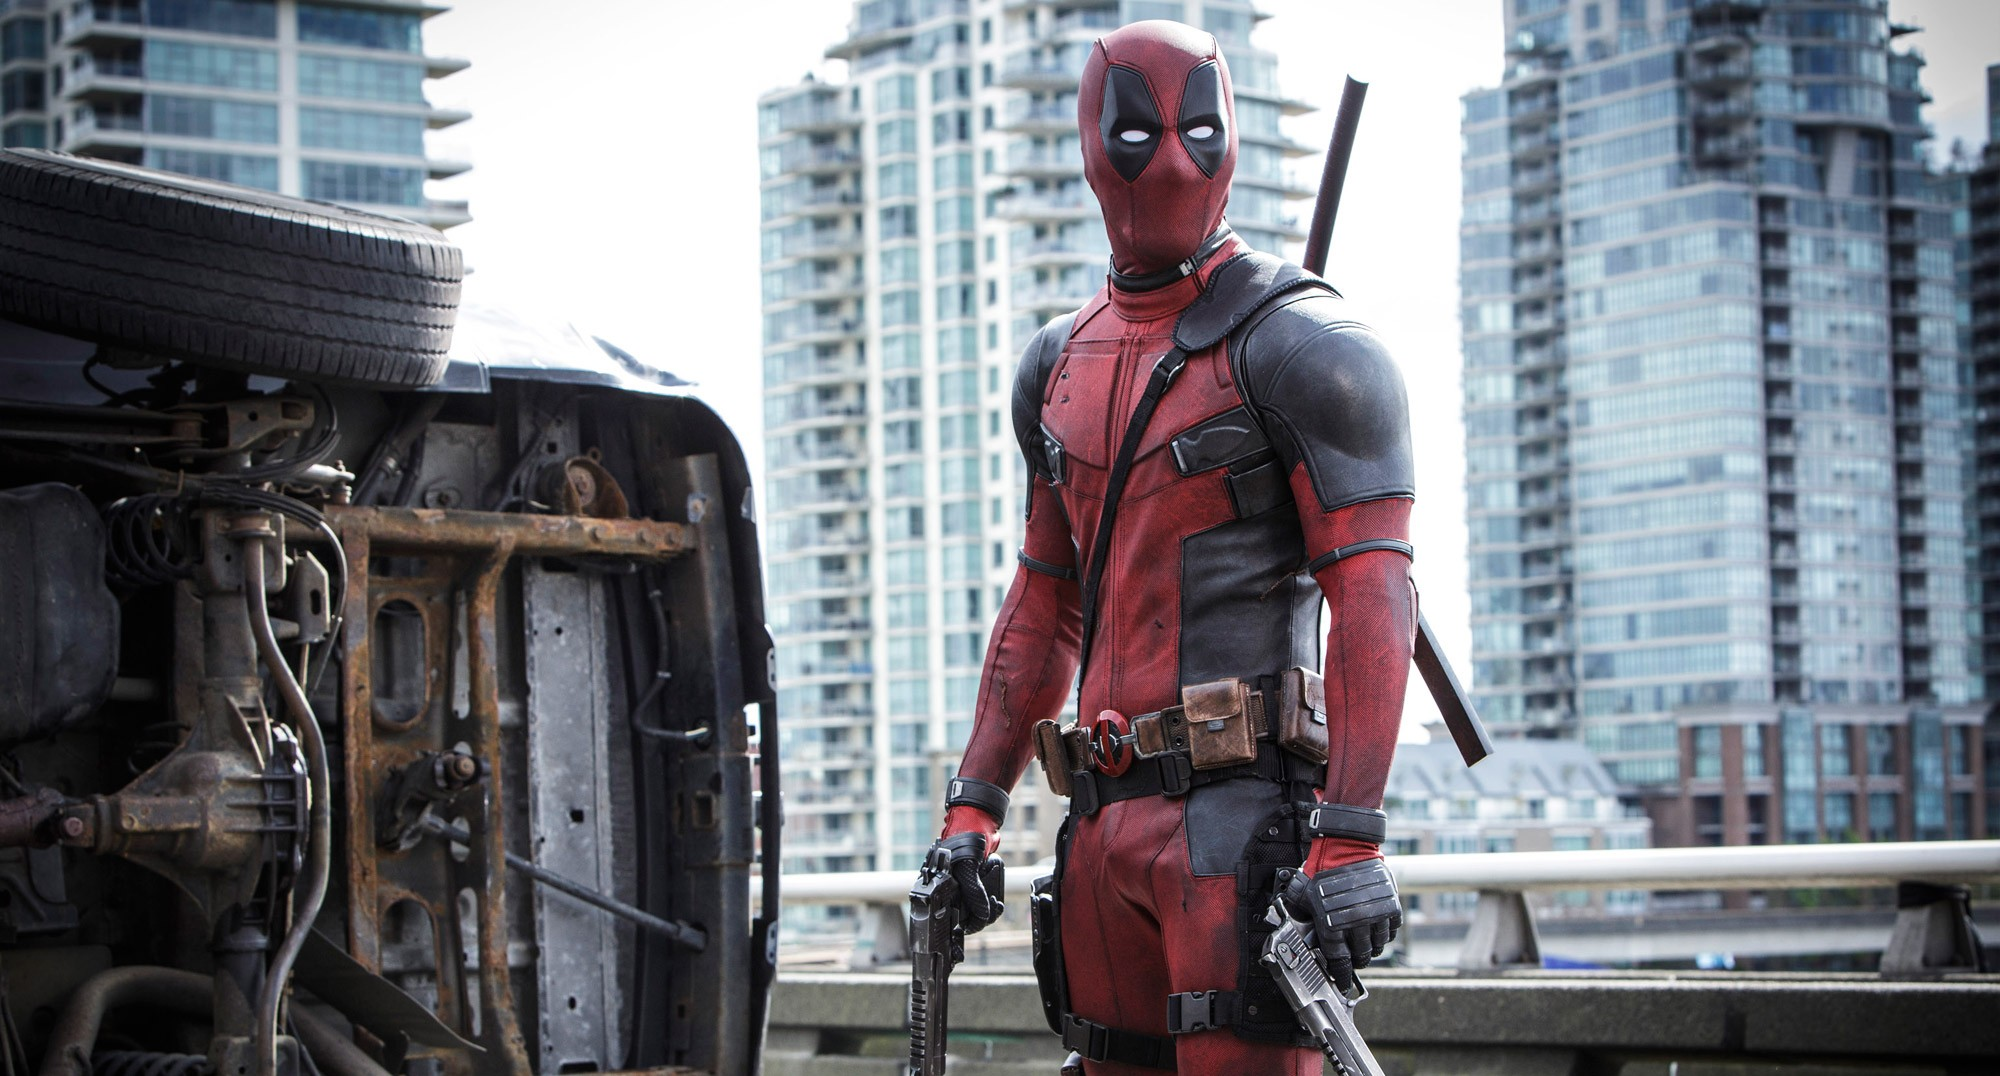 'Deadpool' (2016) Promotional Photo